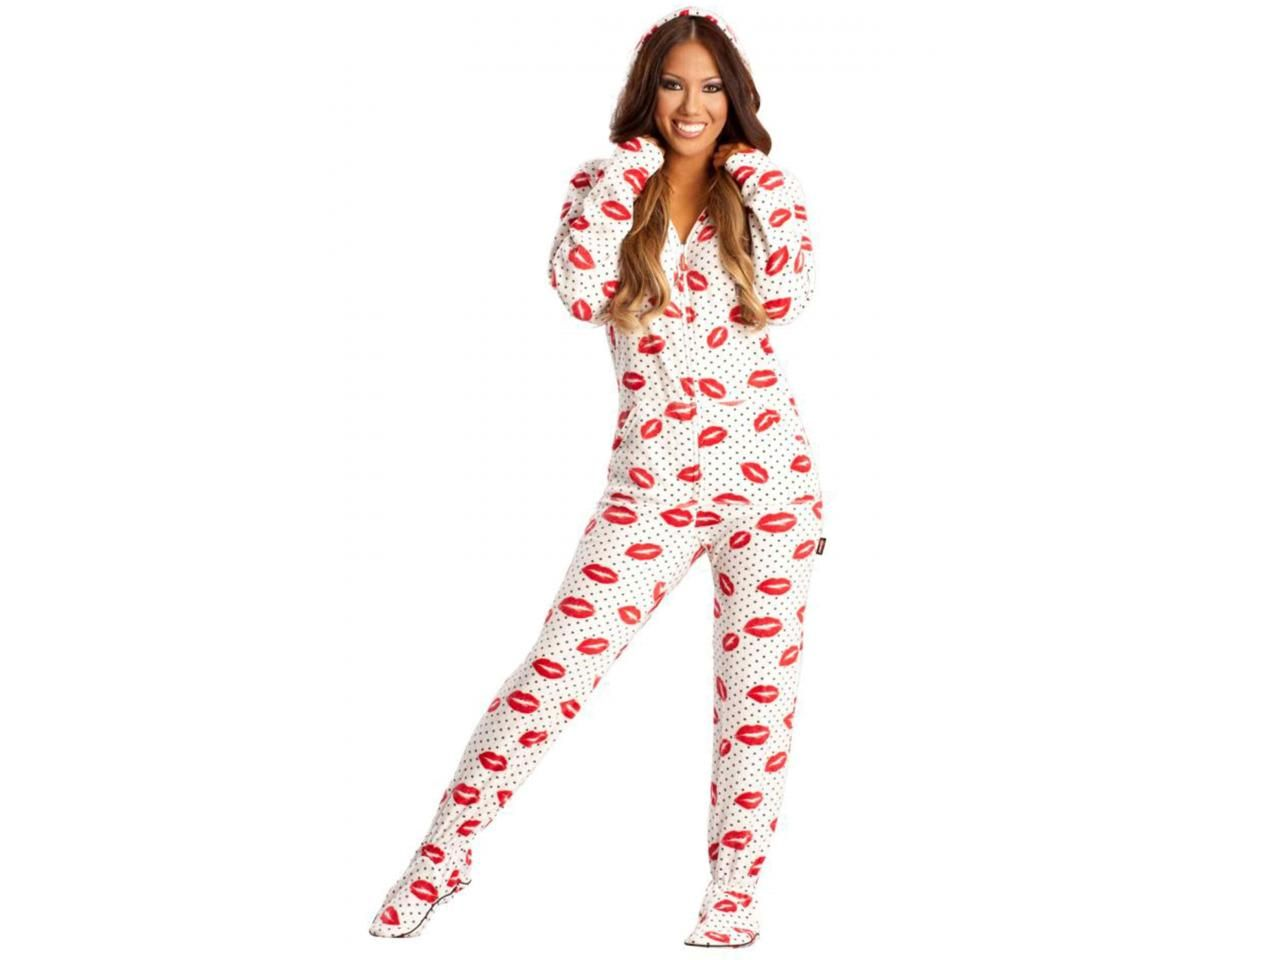 Wholesale Ready To Ship Sexy Satin Silk Pajamas Lingerie Set Sexy Night Wear For Women